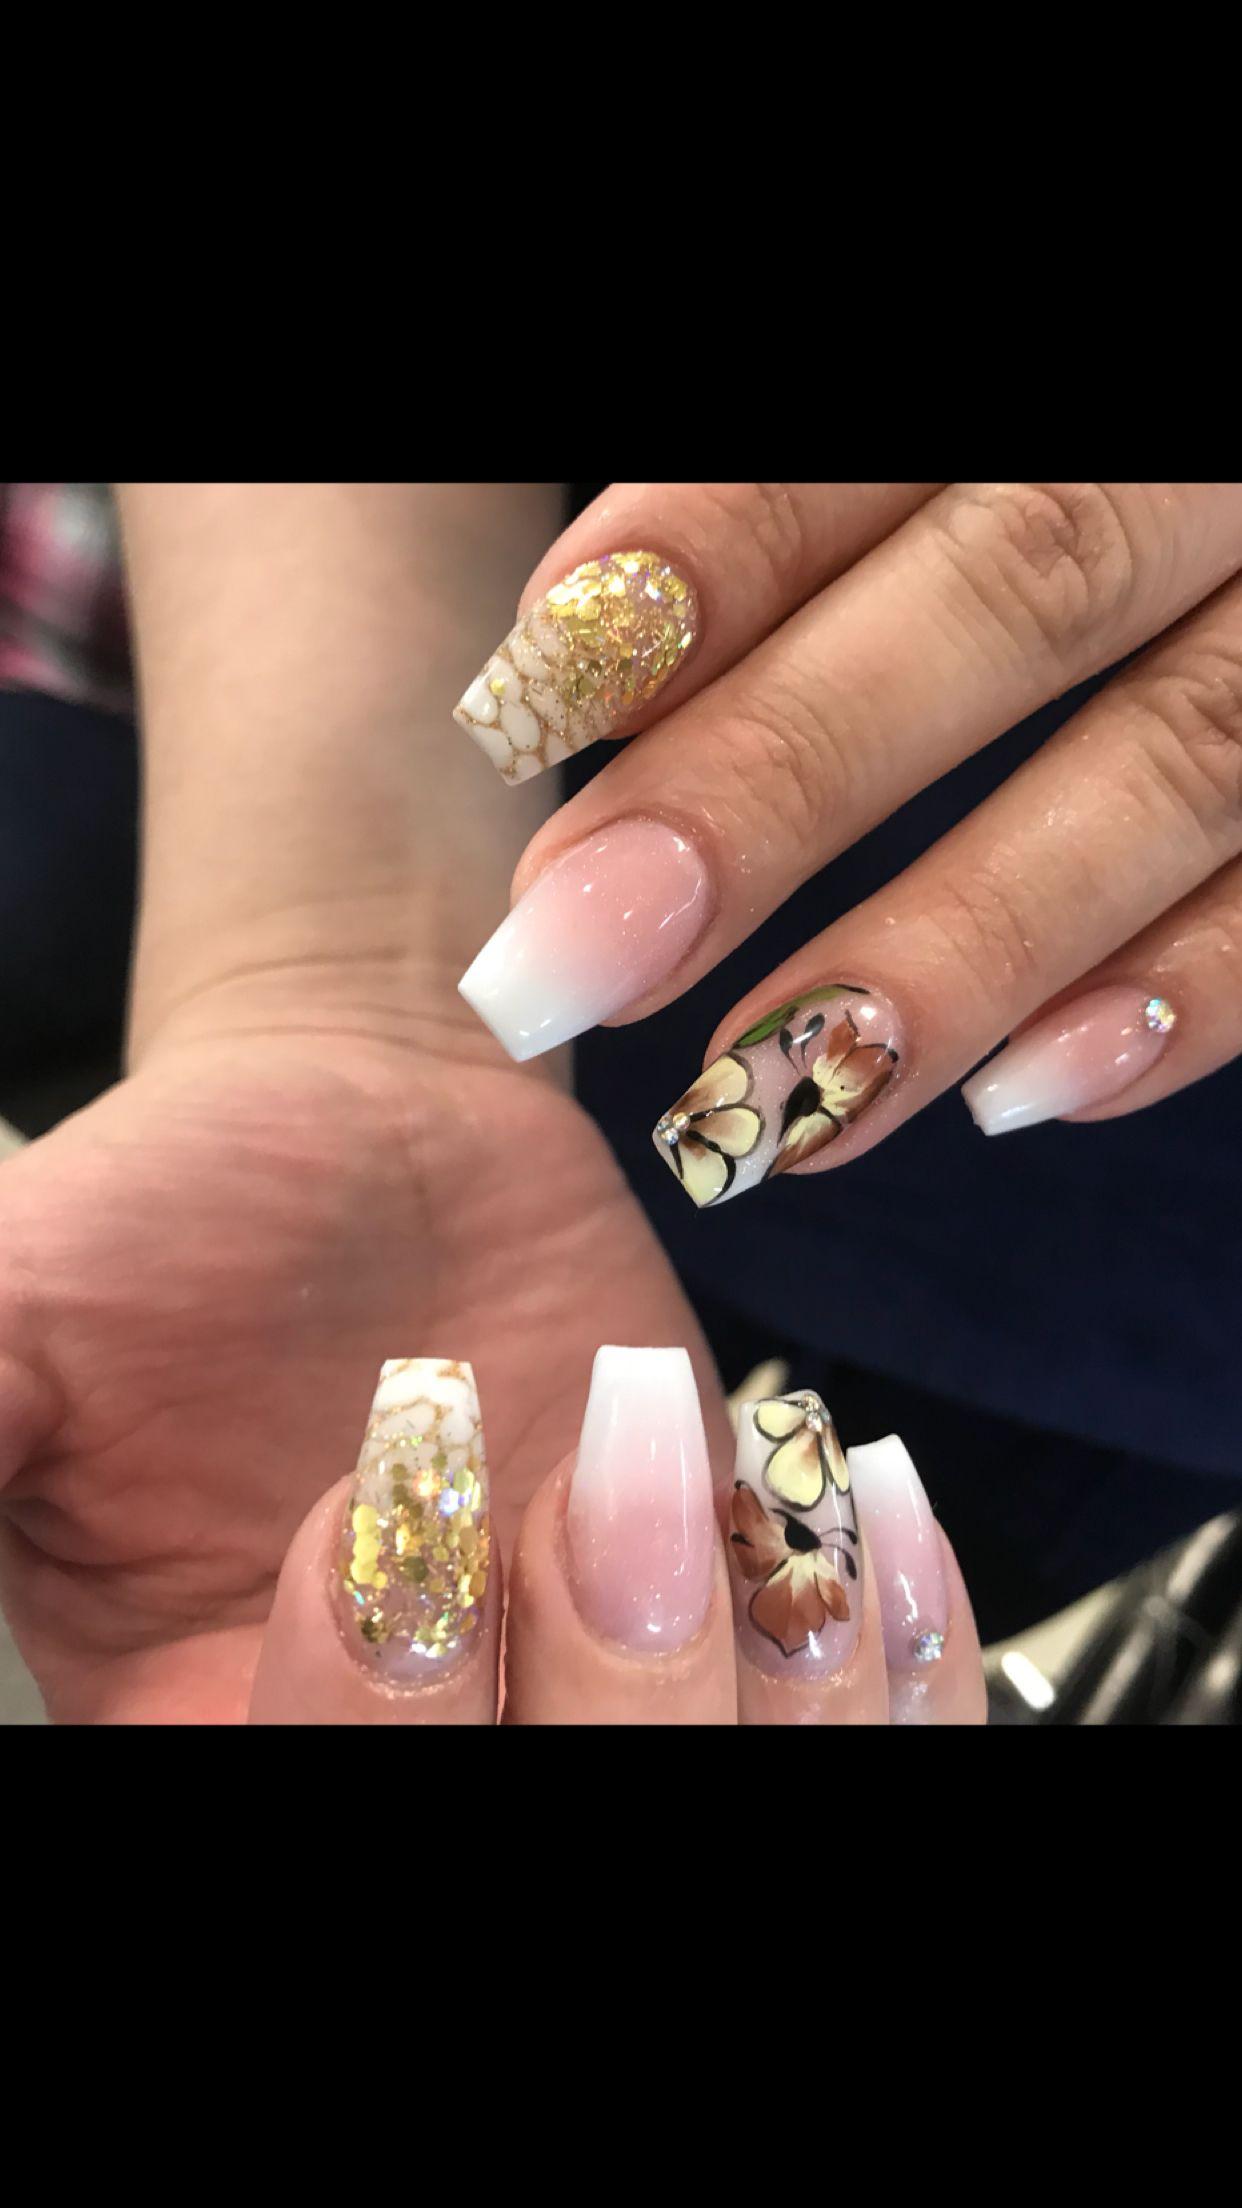 Pin by Maika's Nails on Maika's Nails Nails, Beauty